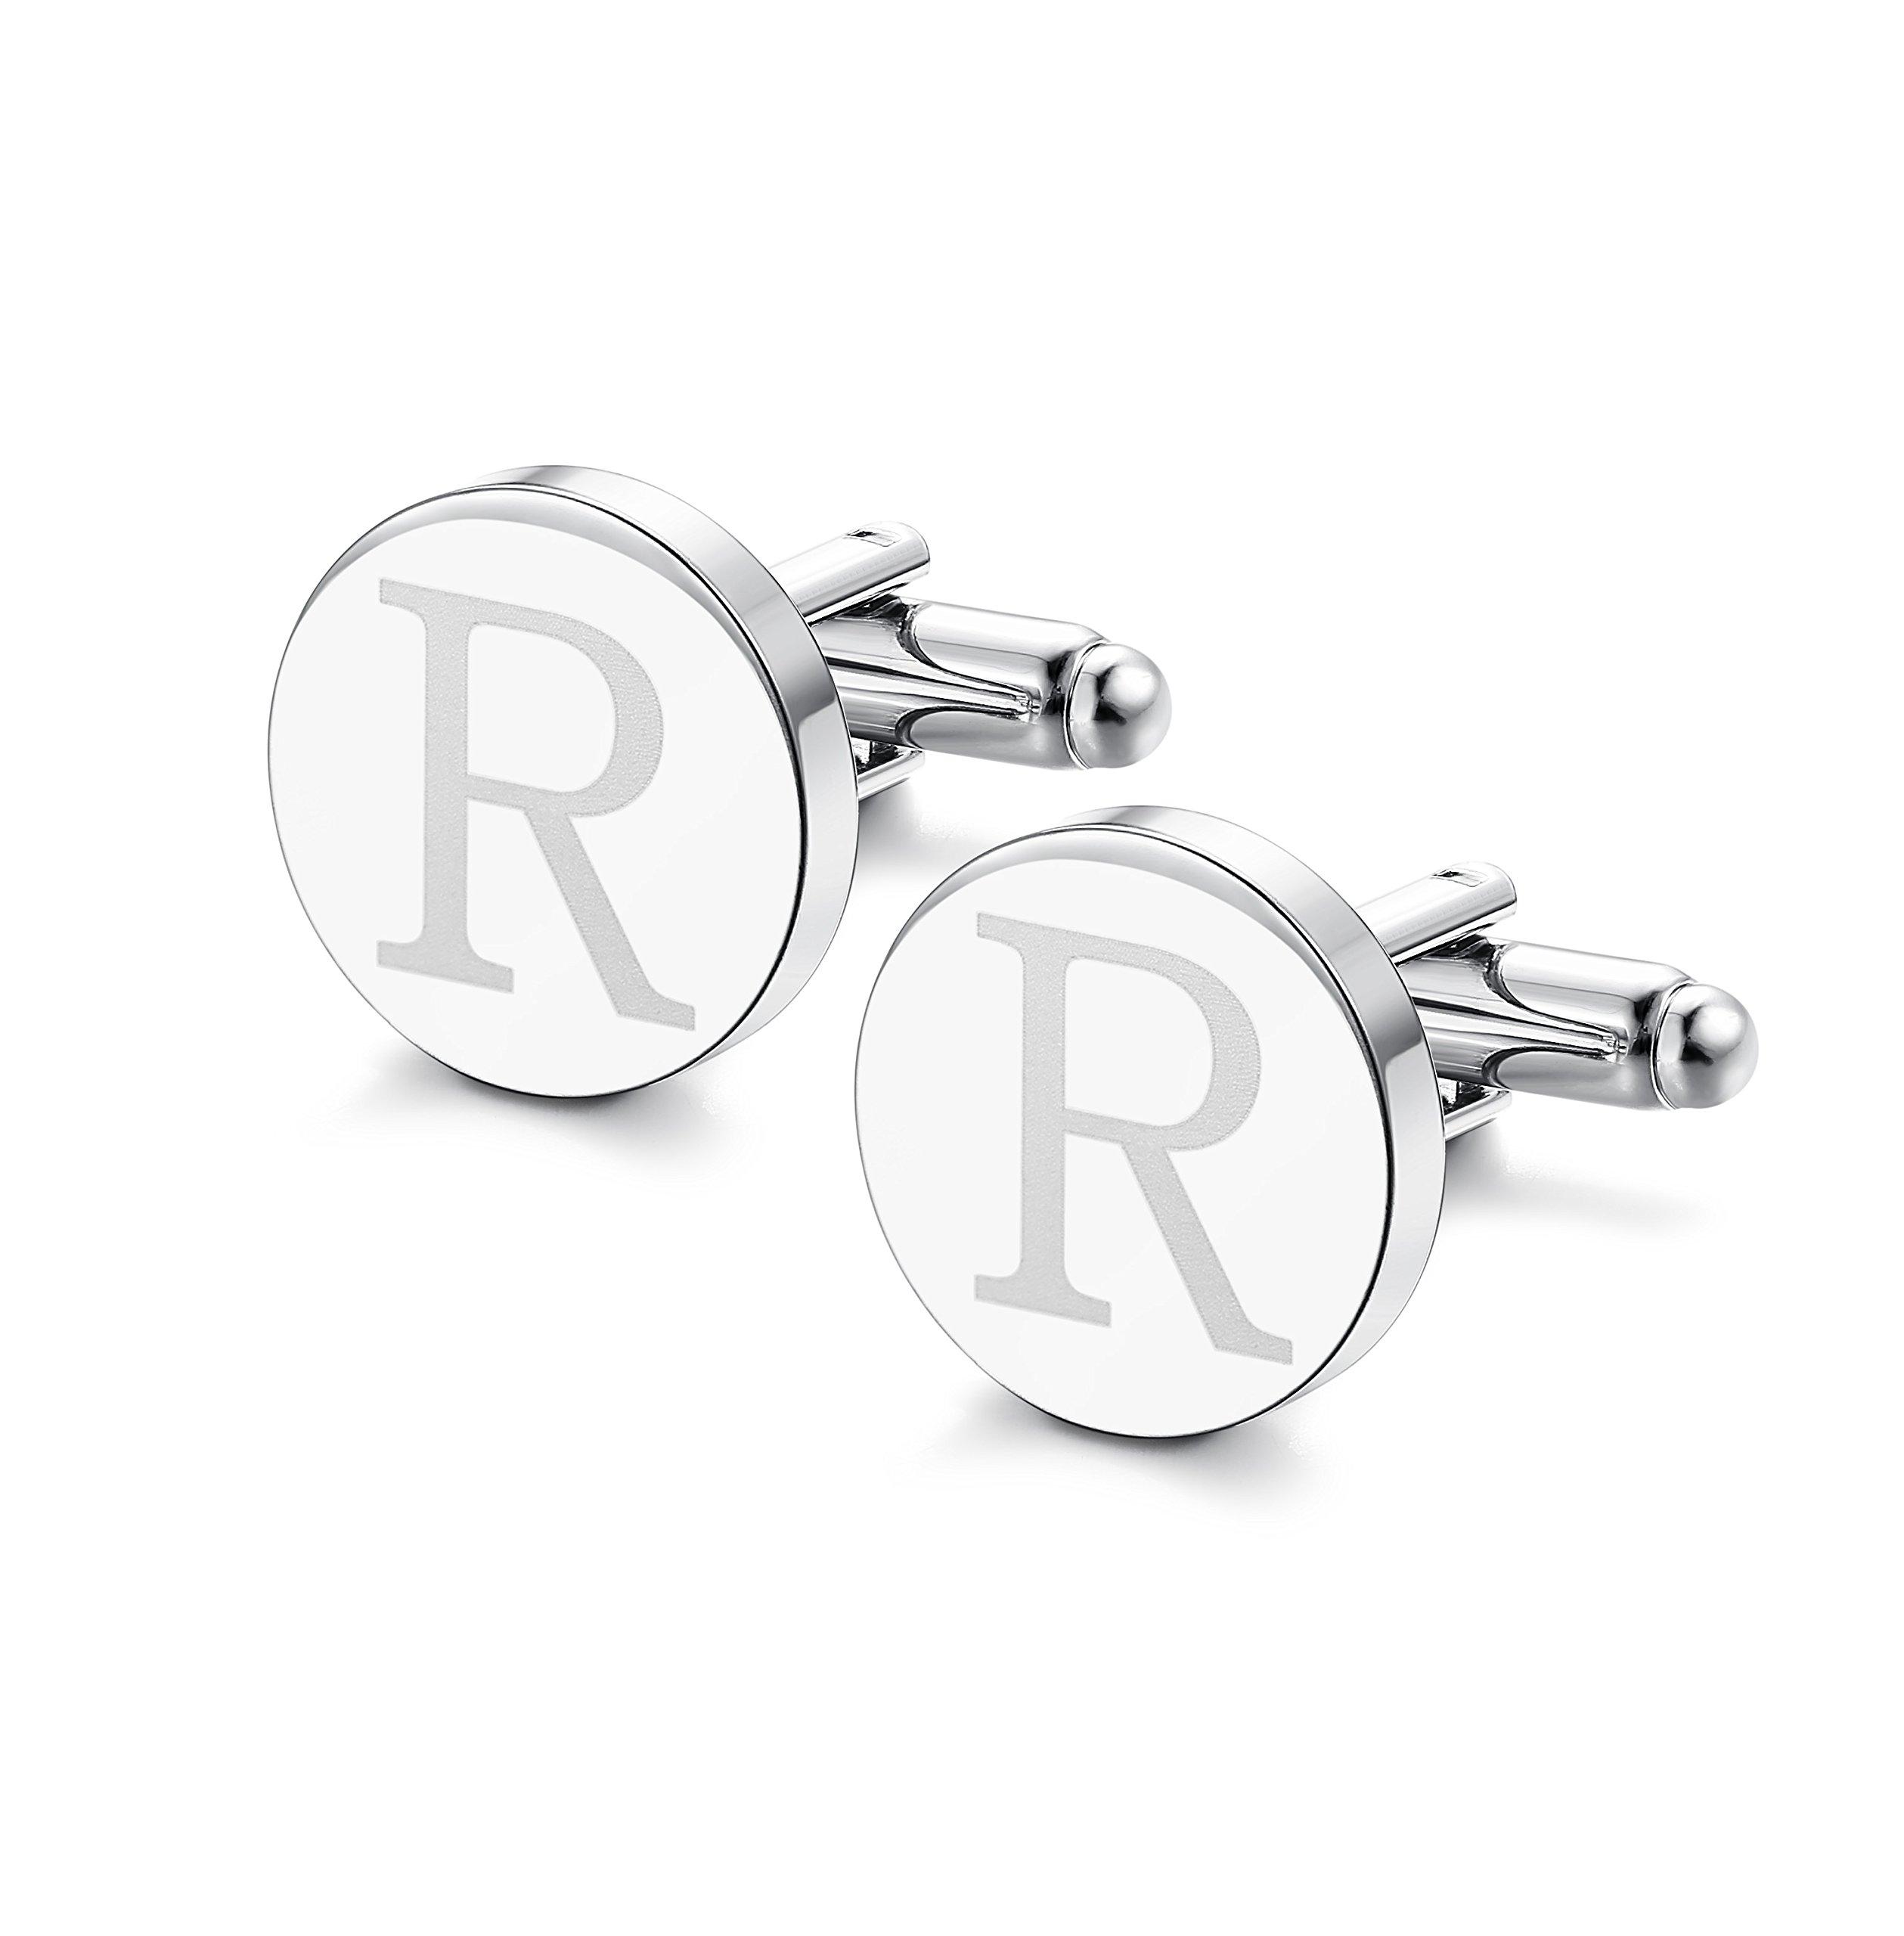 ORAZIO Mens Classic Engraved Initial Cufflinks Alphabet Letter Cufflinks Formal Kit Business Wedding Shirts R